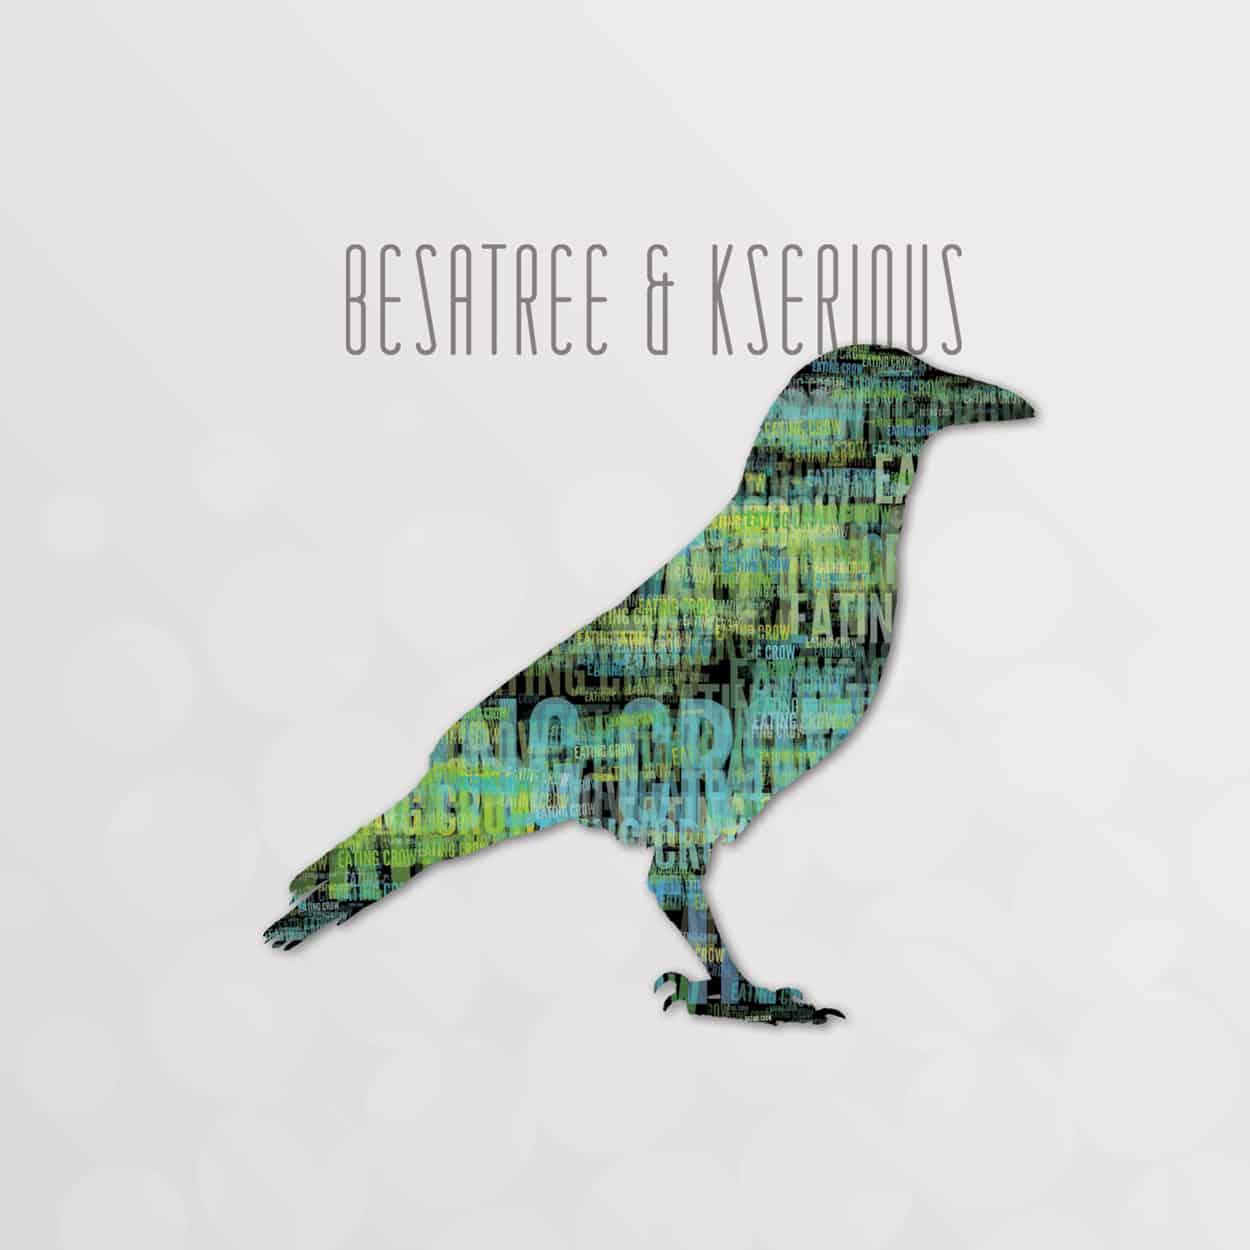 besatree & kserious - eating crow - cd design